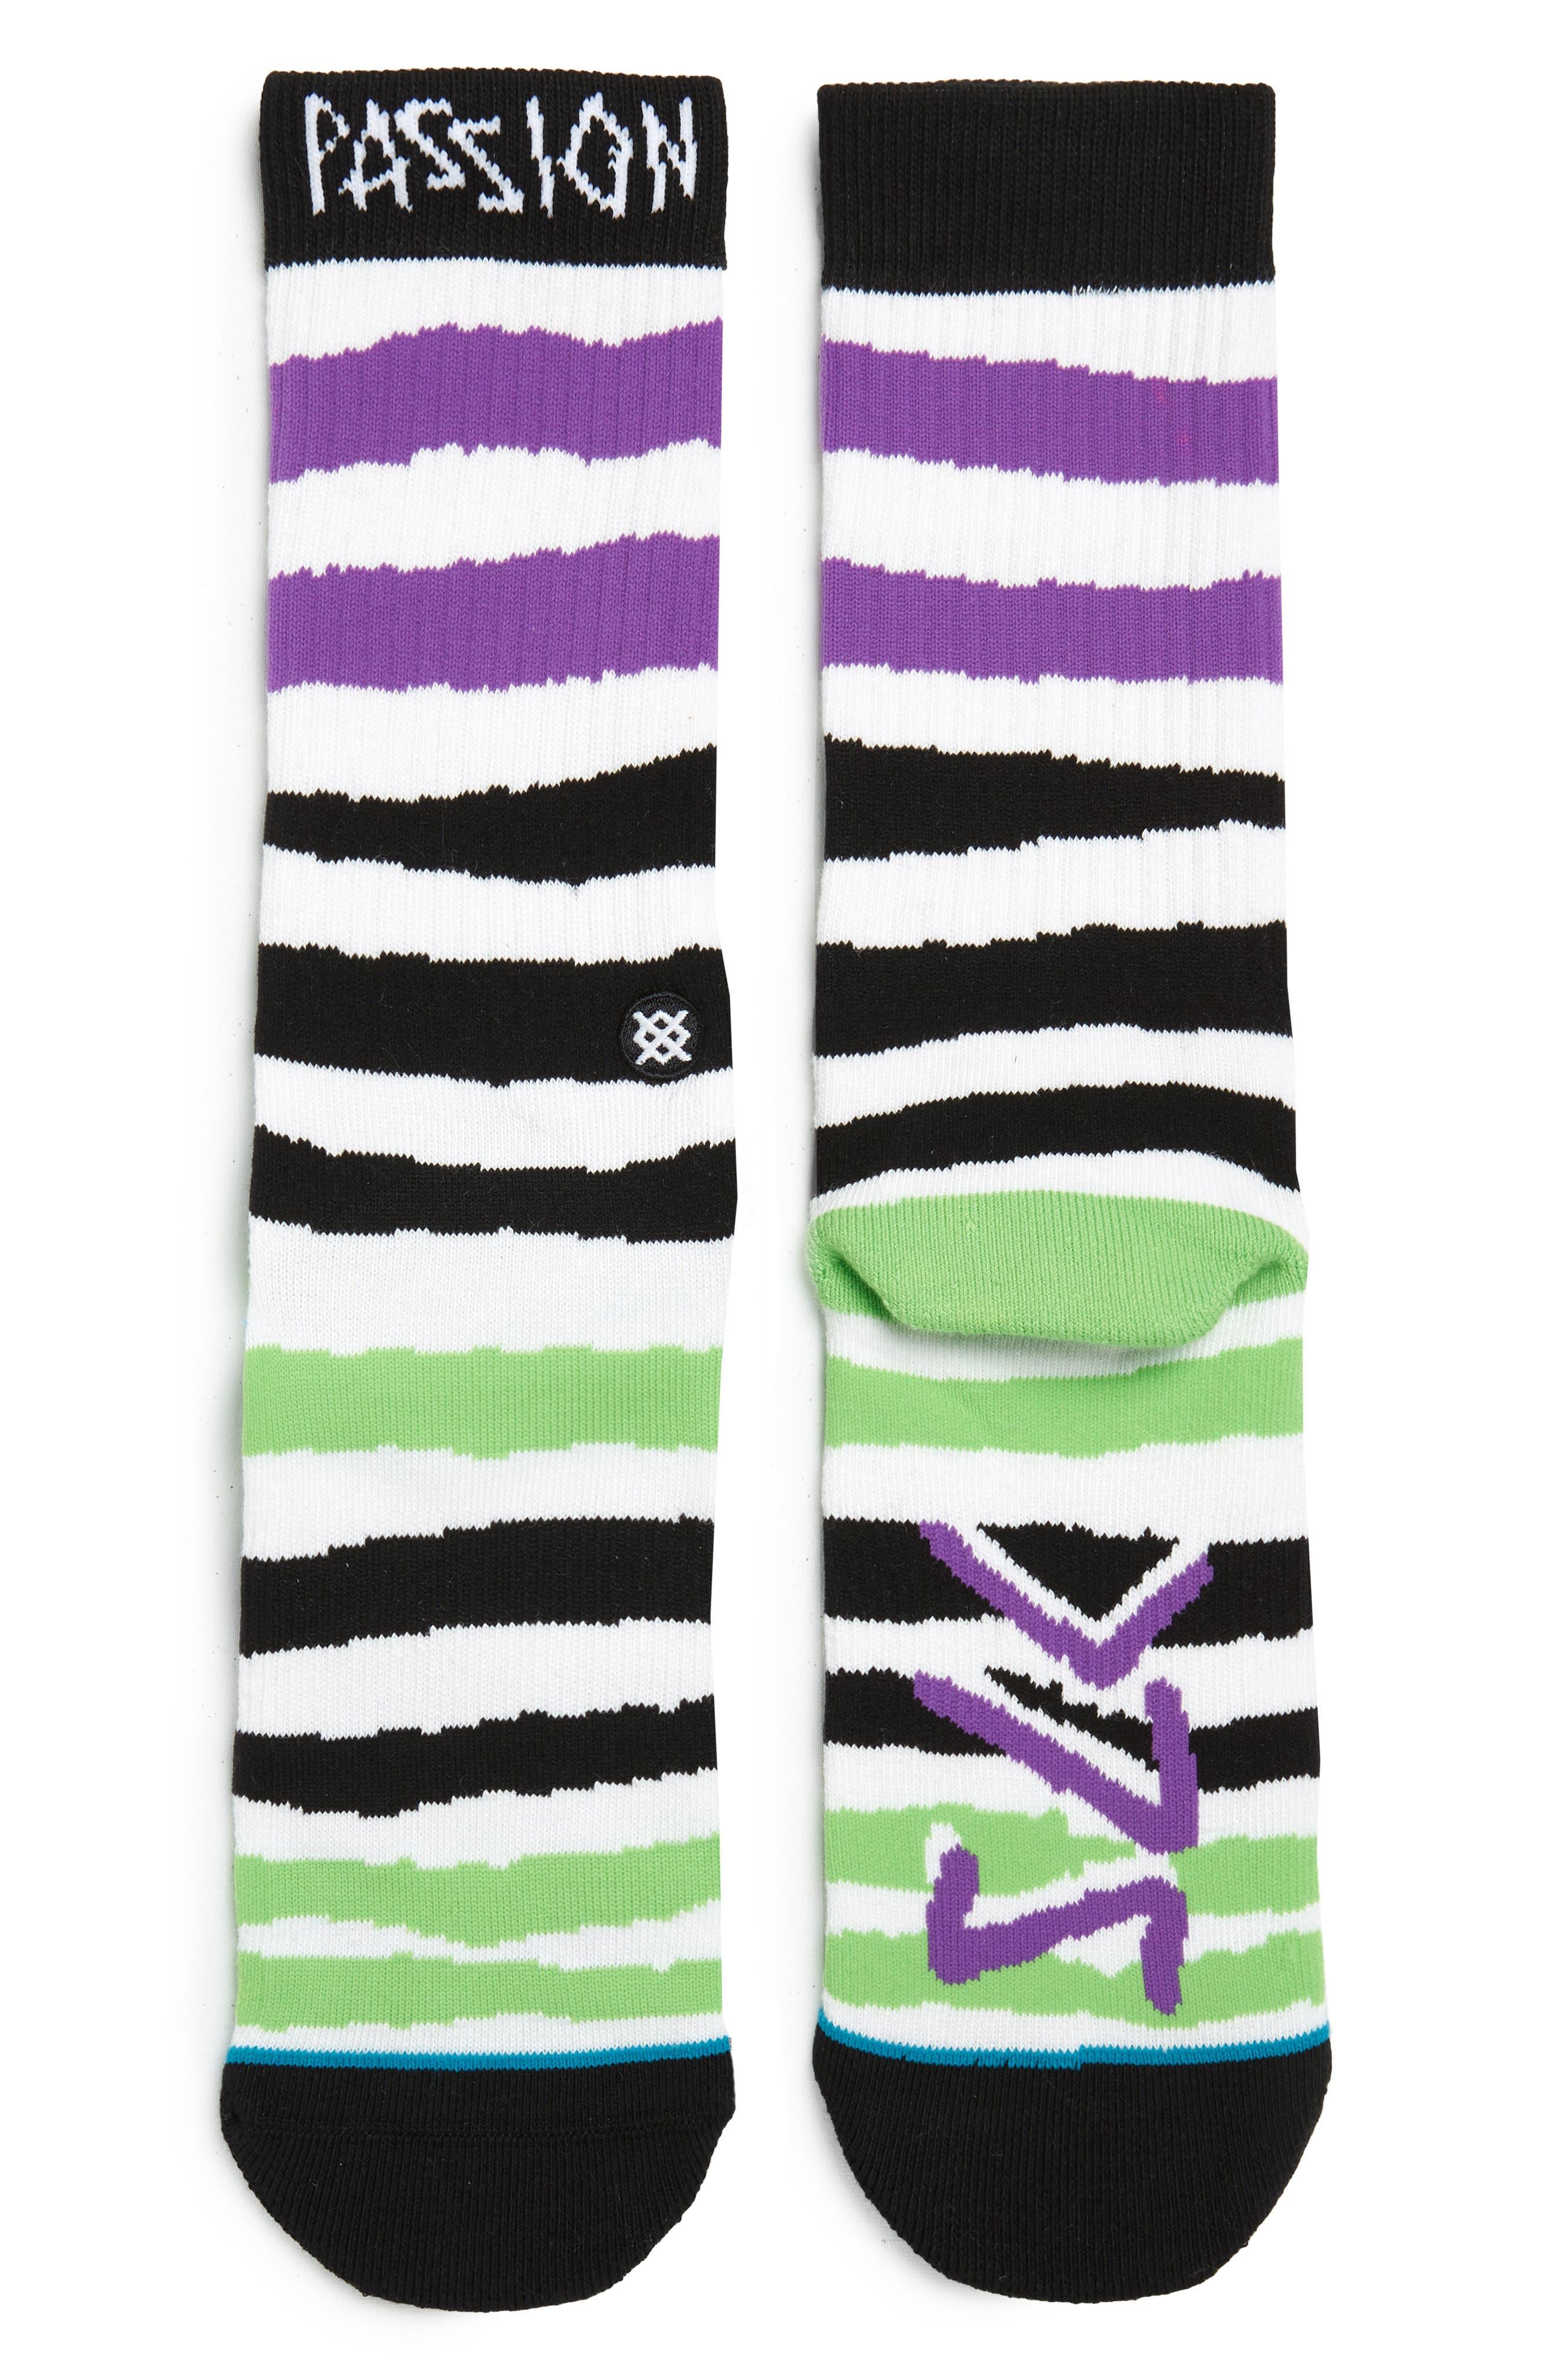 Passion LK Socks,                         Main,                         color, BLACK